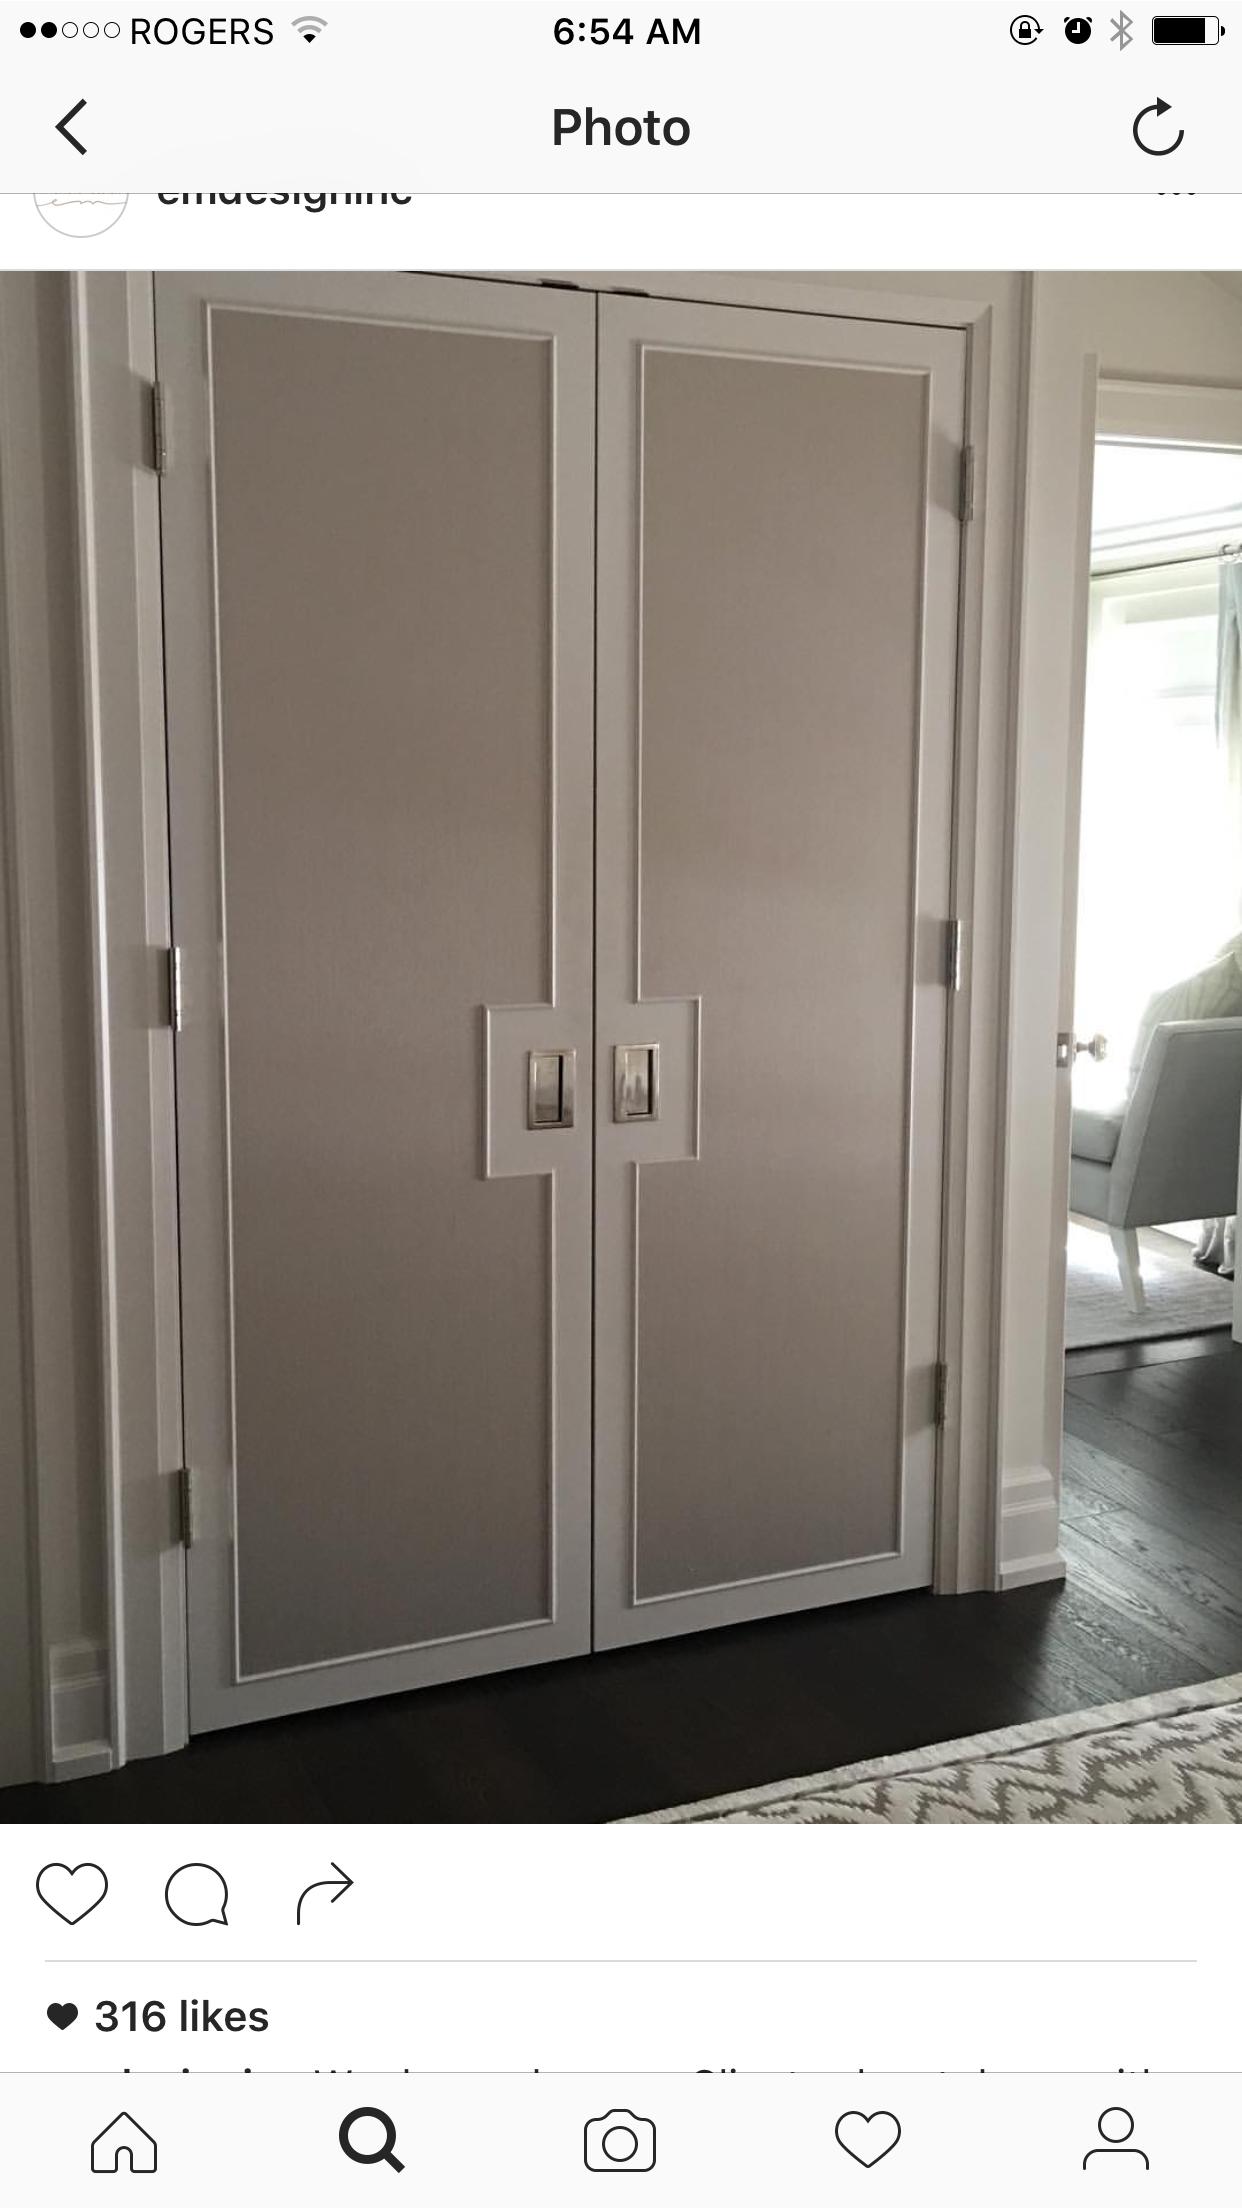 Closet Doors, Polished Nickel, Closets, Bathrooms, Chic, Glam Bedroom,  Decor, Tvs, Dressing Rooms